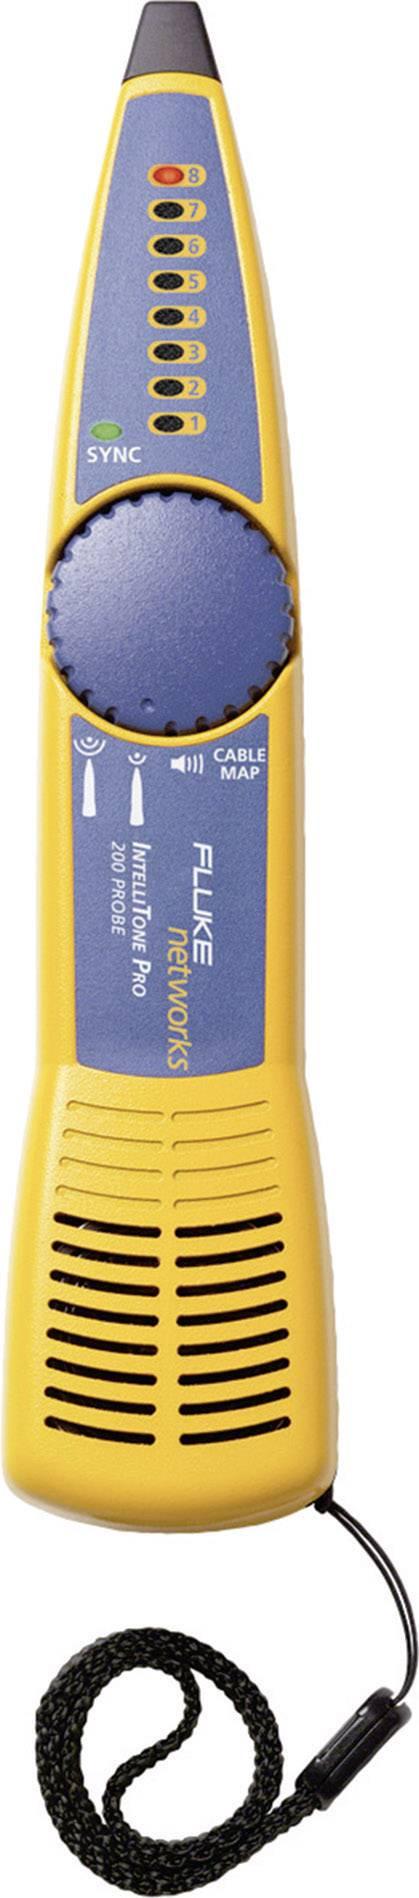 Tester inštalácie káblov Fluke Networks MT-8200-63A IntelliTone 200 Probe